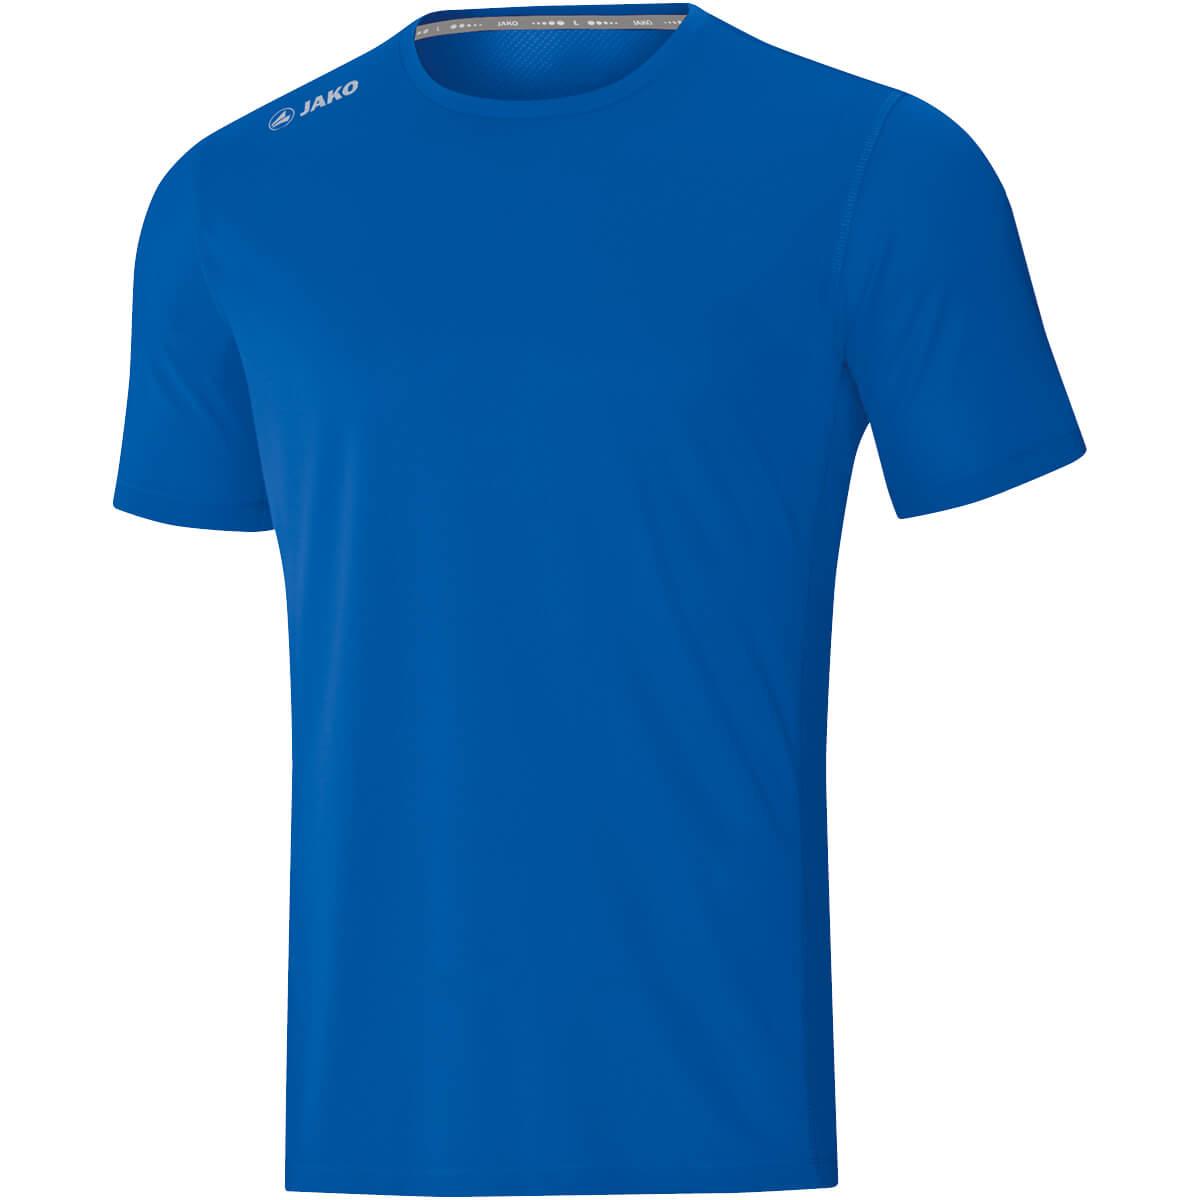 Jako T-Shirt Run 2.0 Herren 6175  | div. Größen / Farben